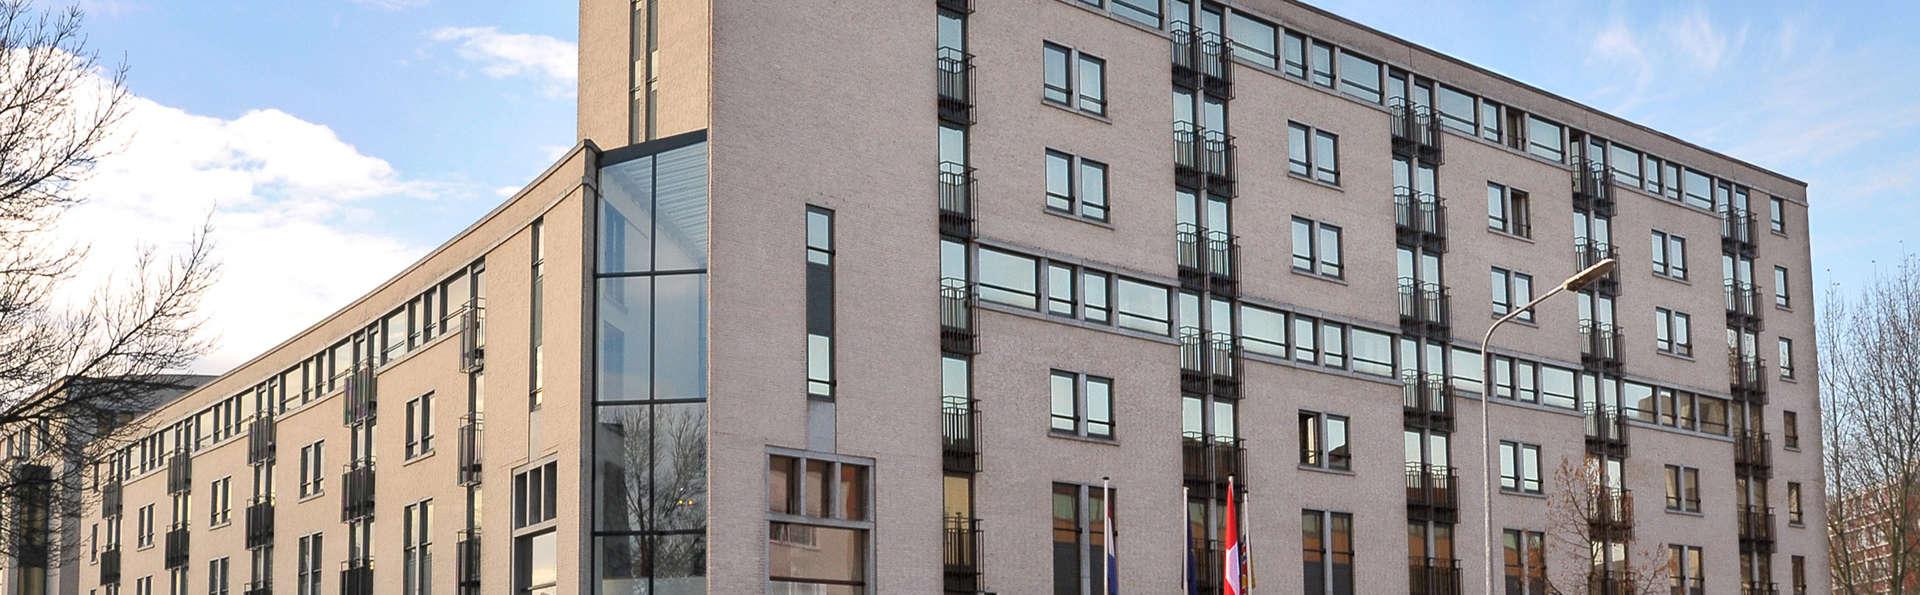 Apart Hotel Randwyck - EDIT_front2.jpg